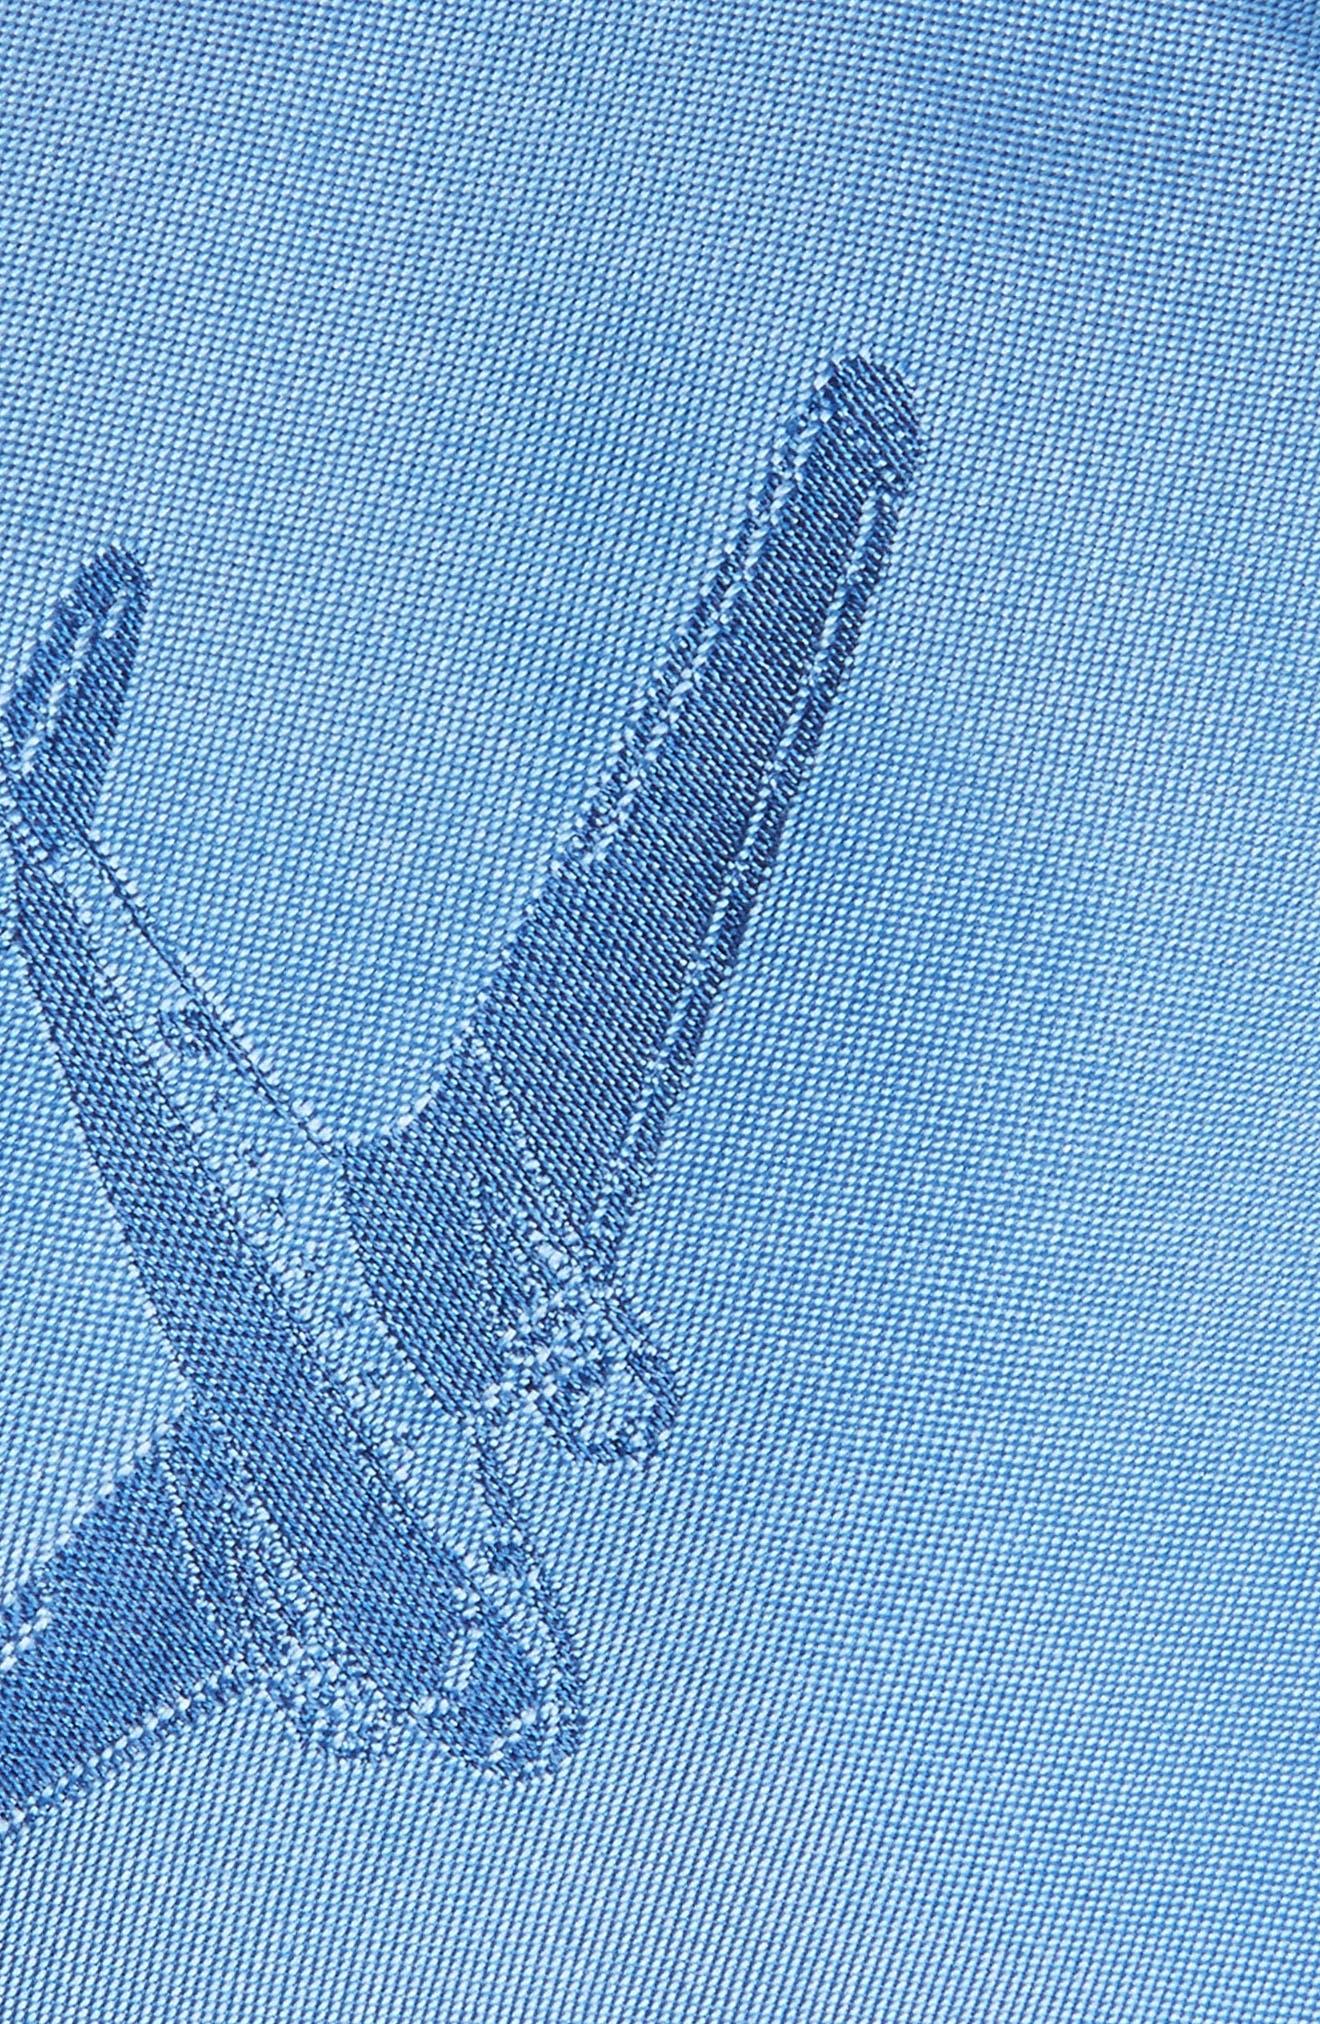 Plane Print Silk Tie,                             Alternate thumbnail 2, color,                             454